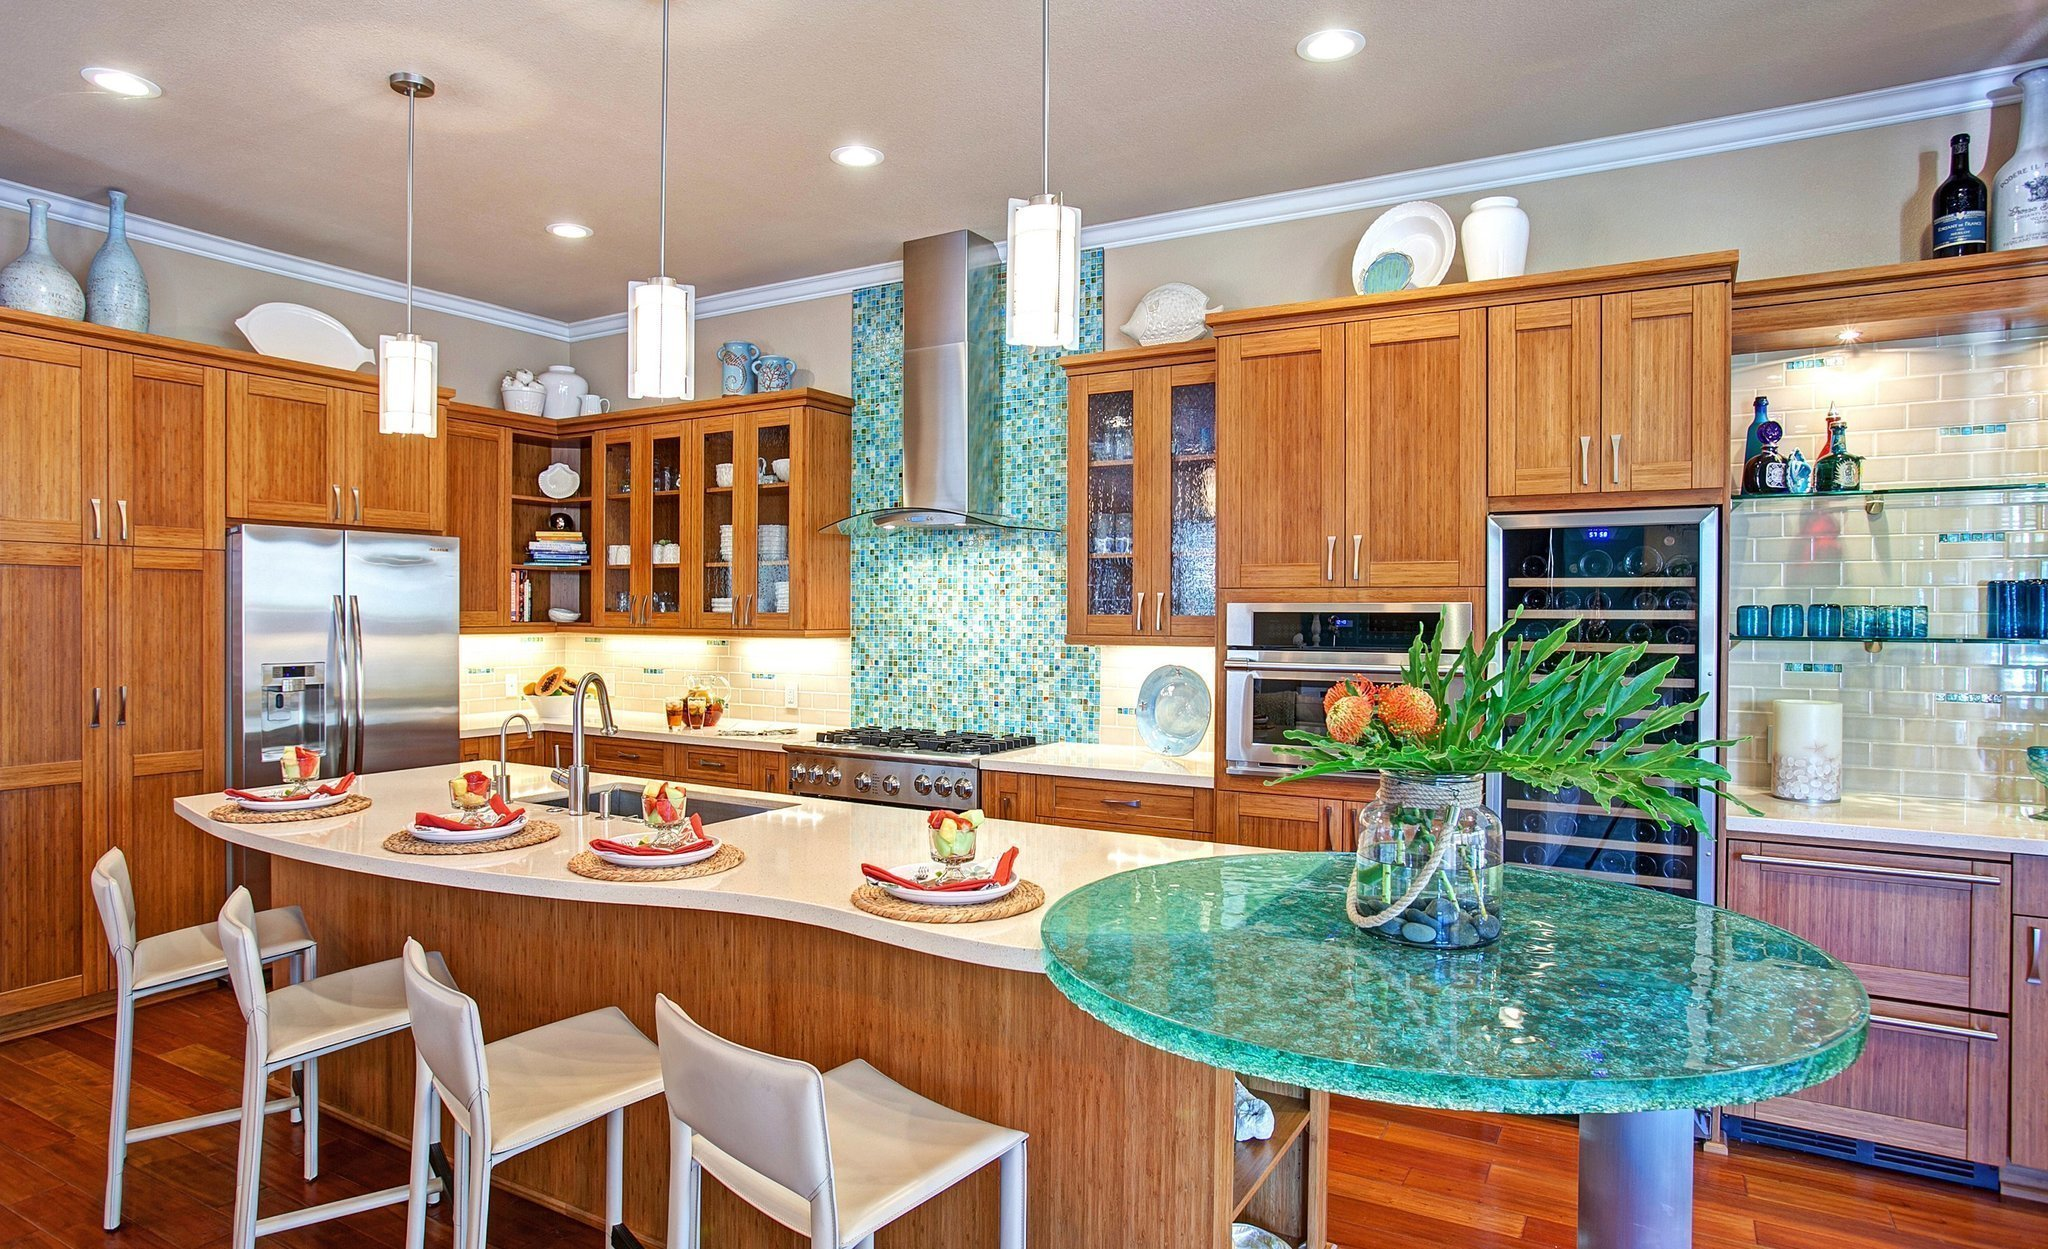 New Kitchen Has Caribbean Vibes The San Diego Union Tribune